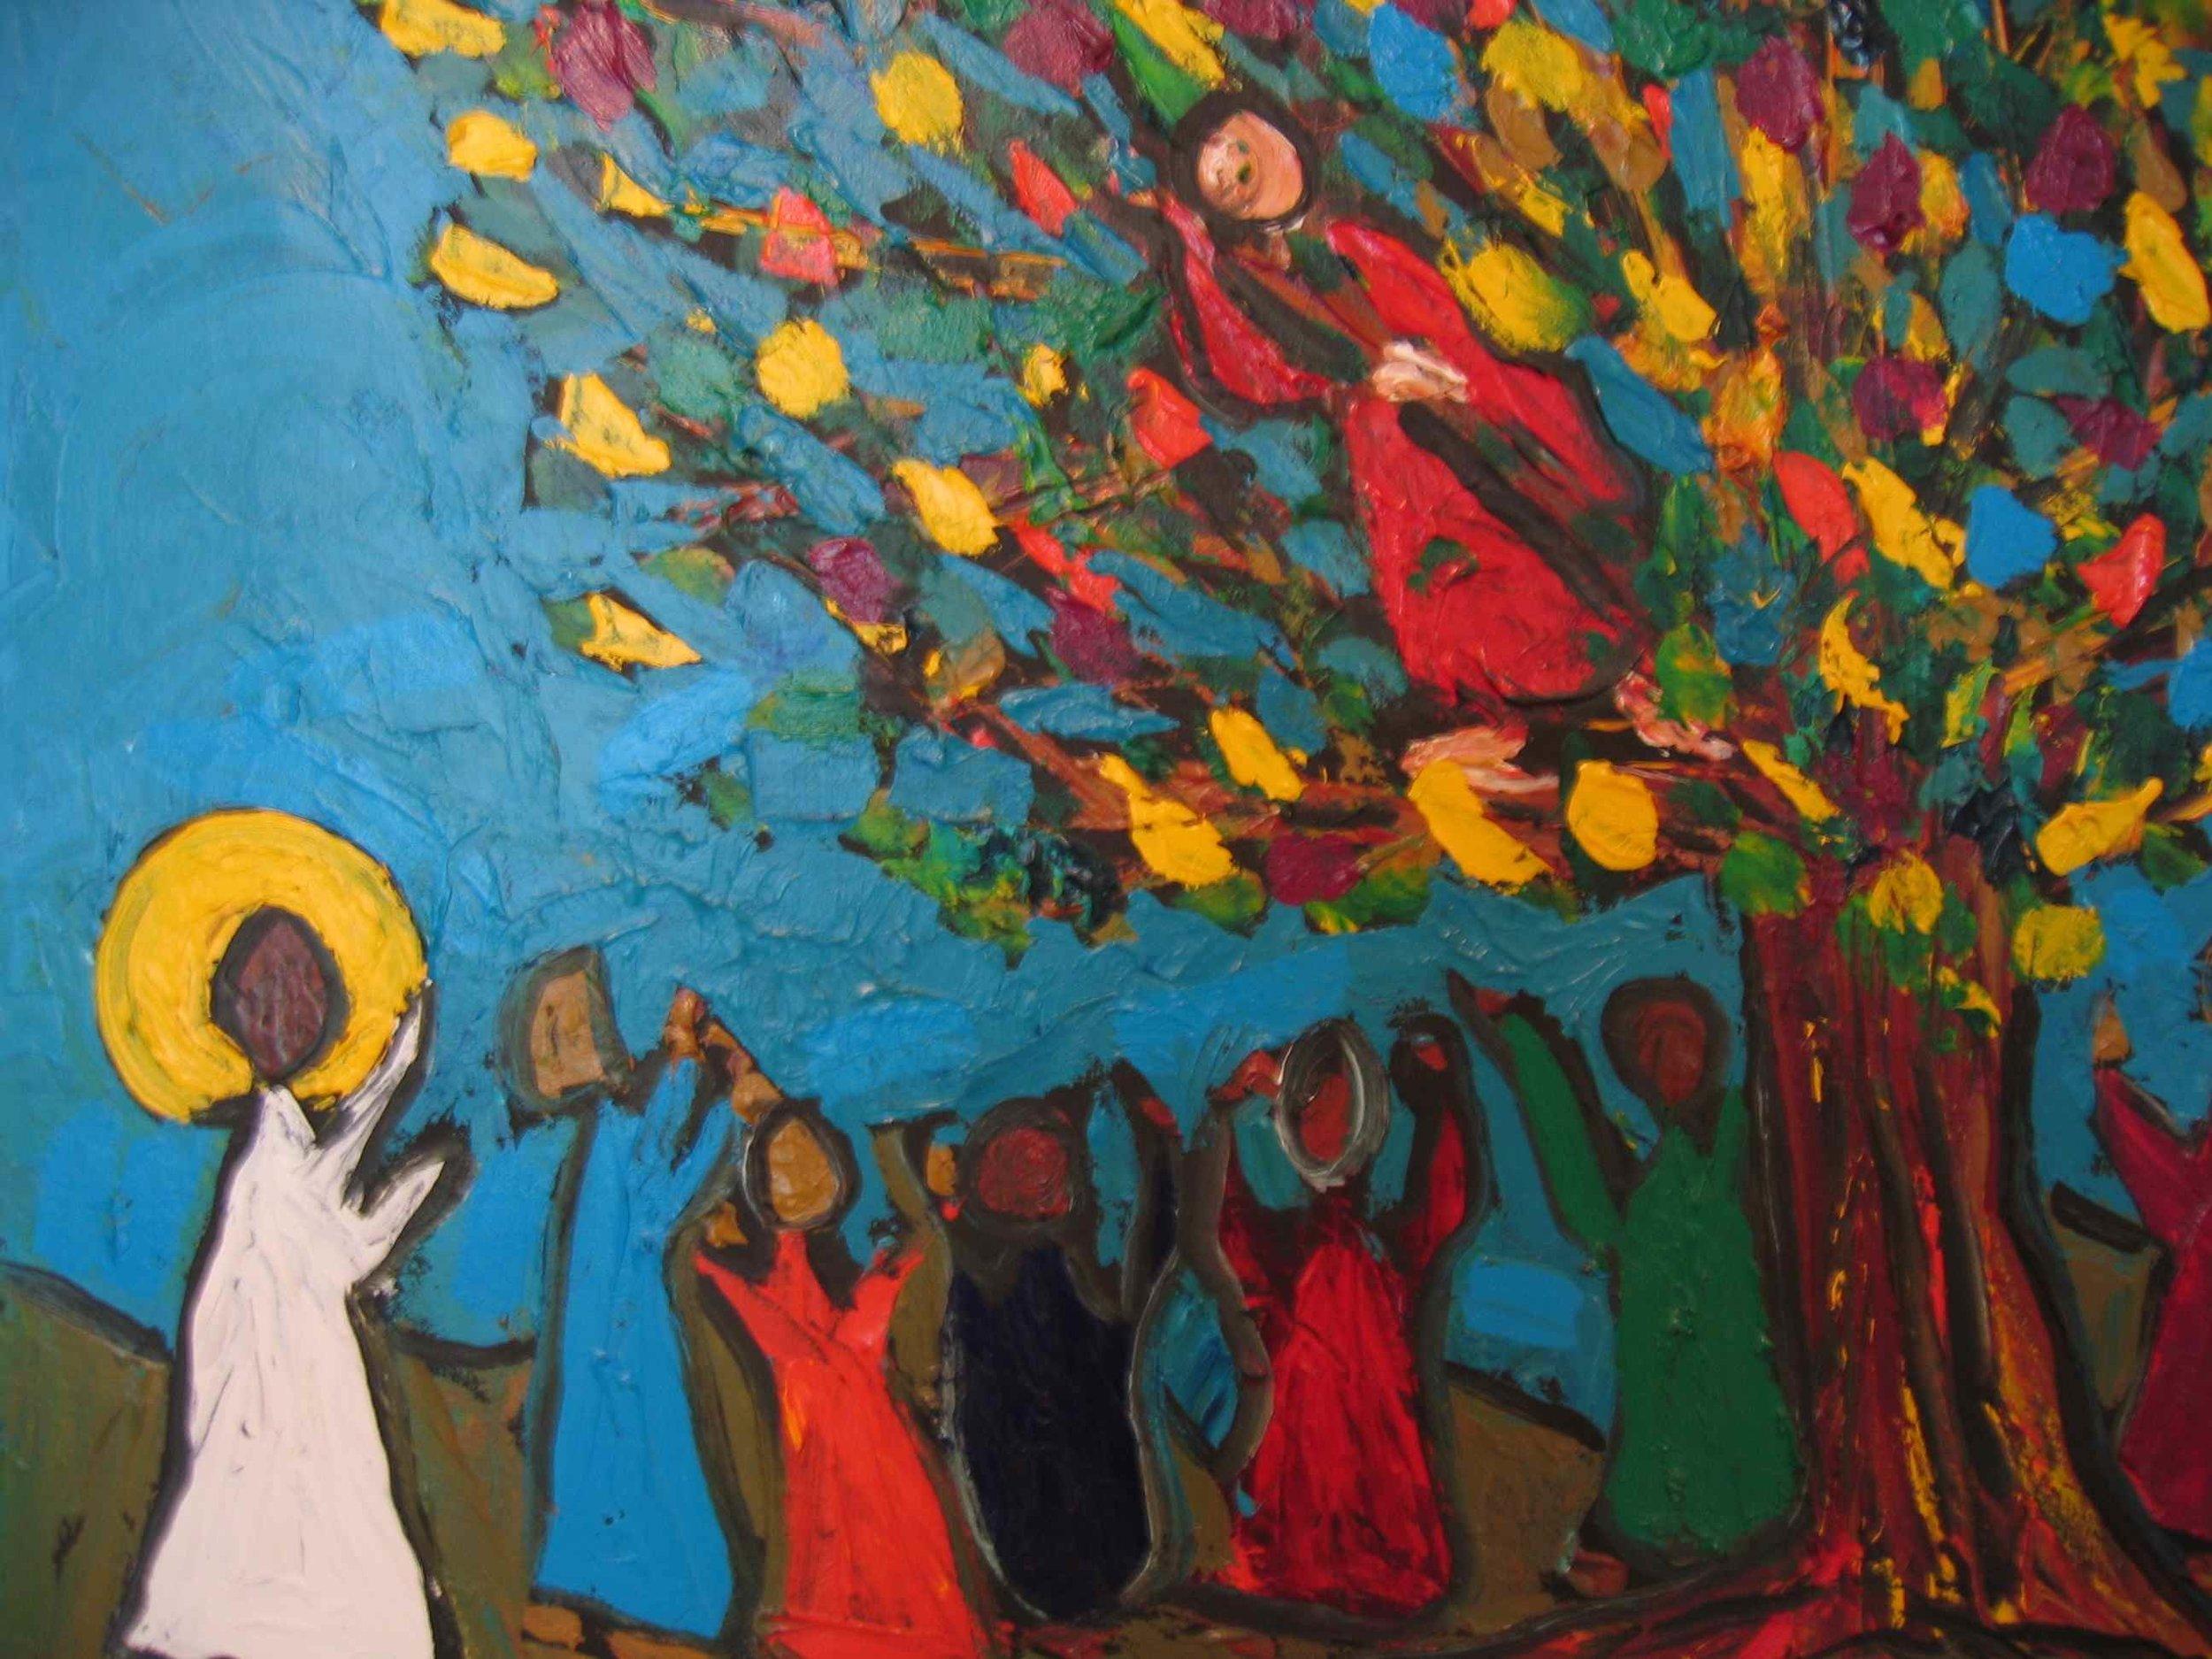 Zacchaeus by Joel Whitehead